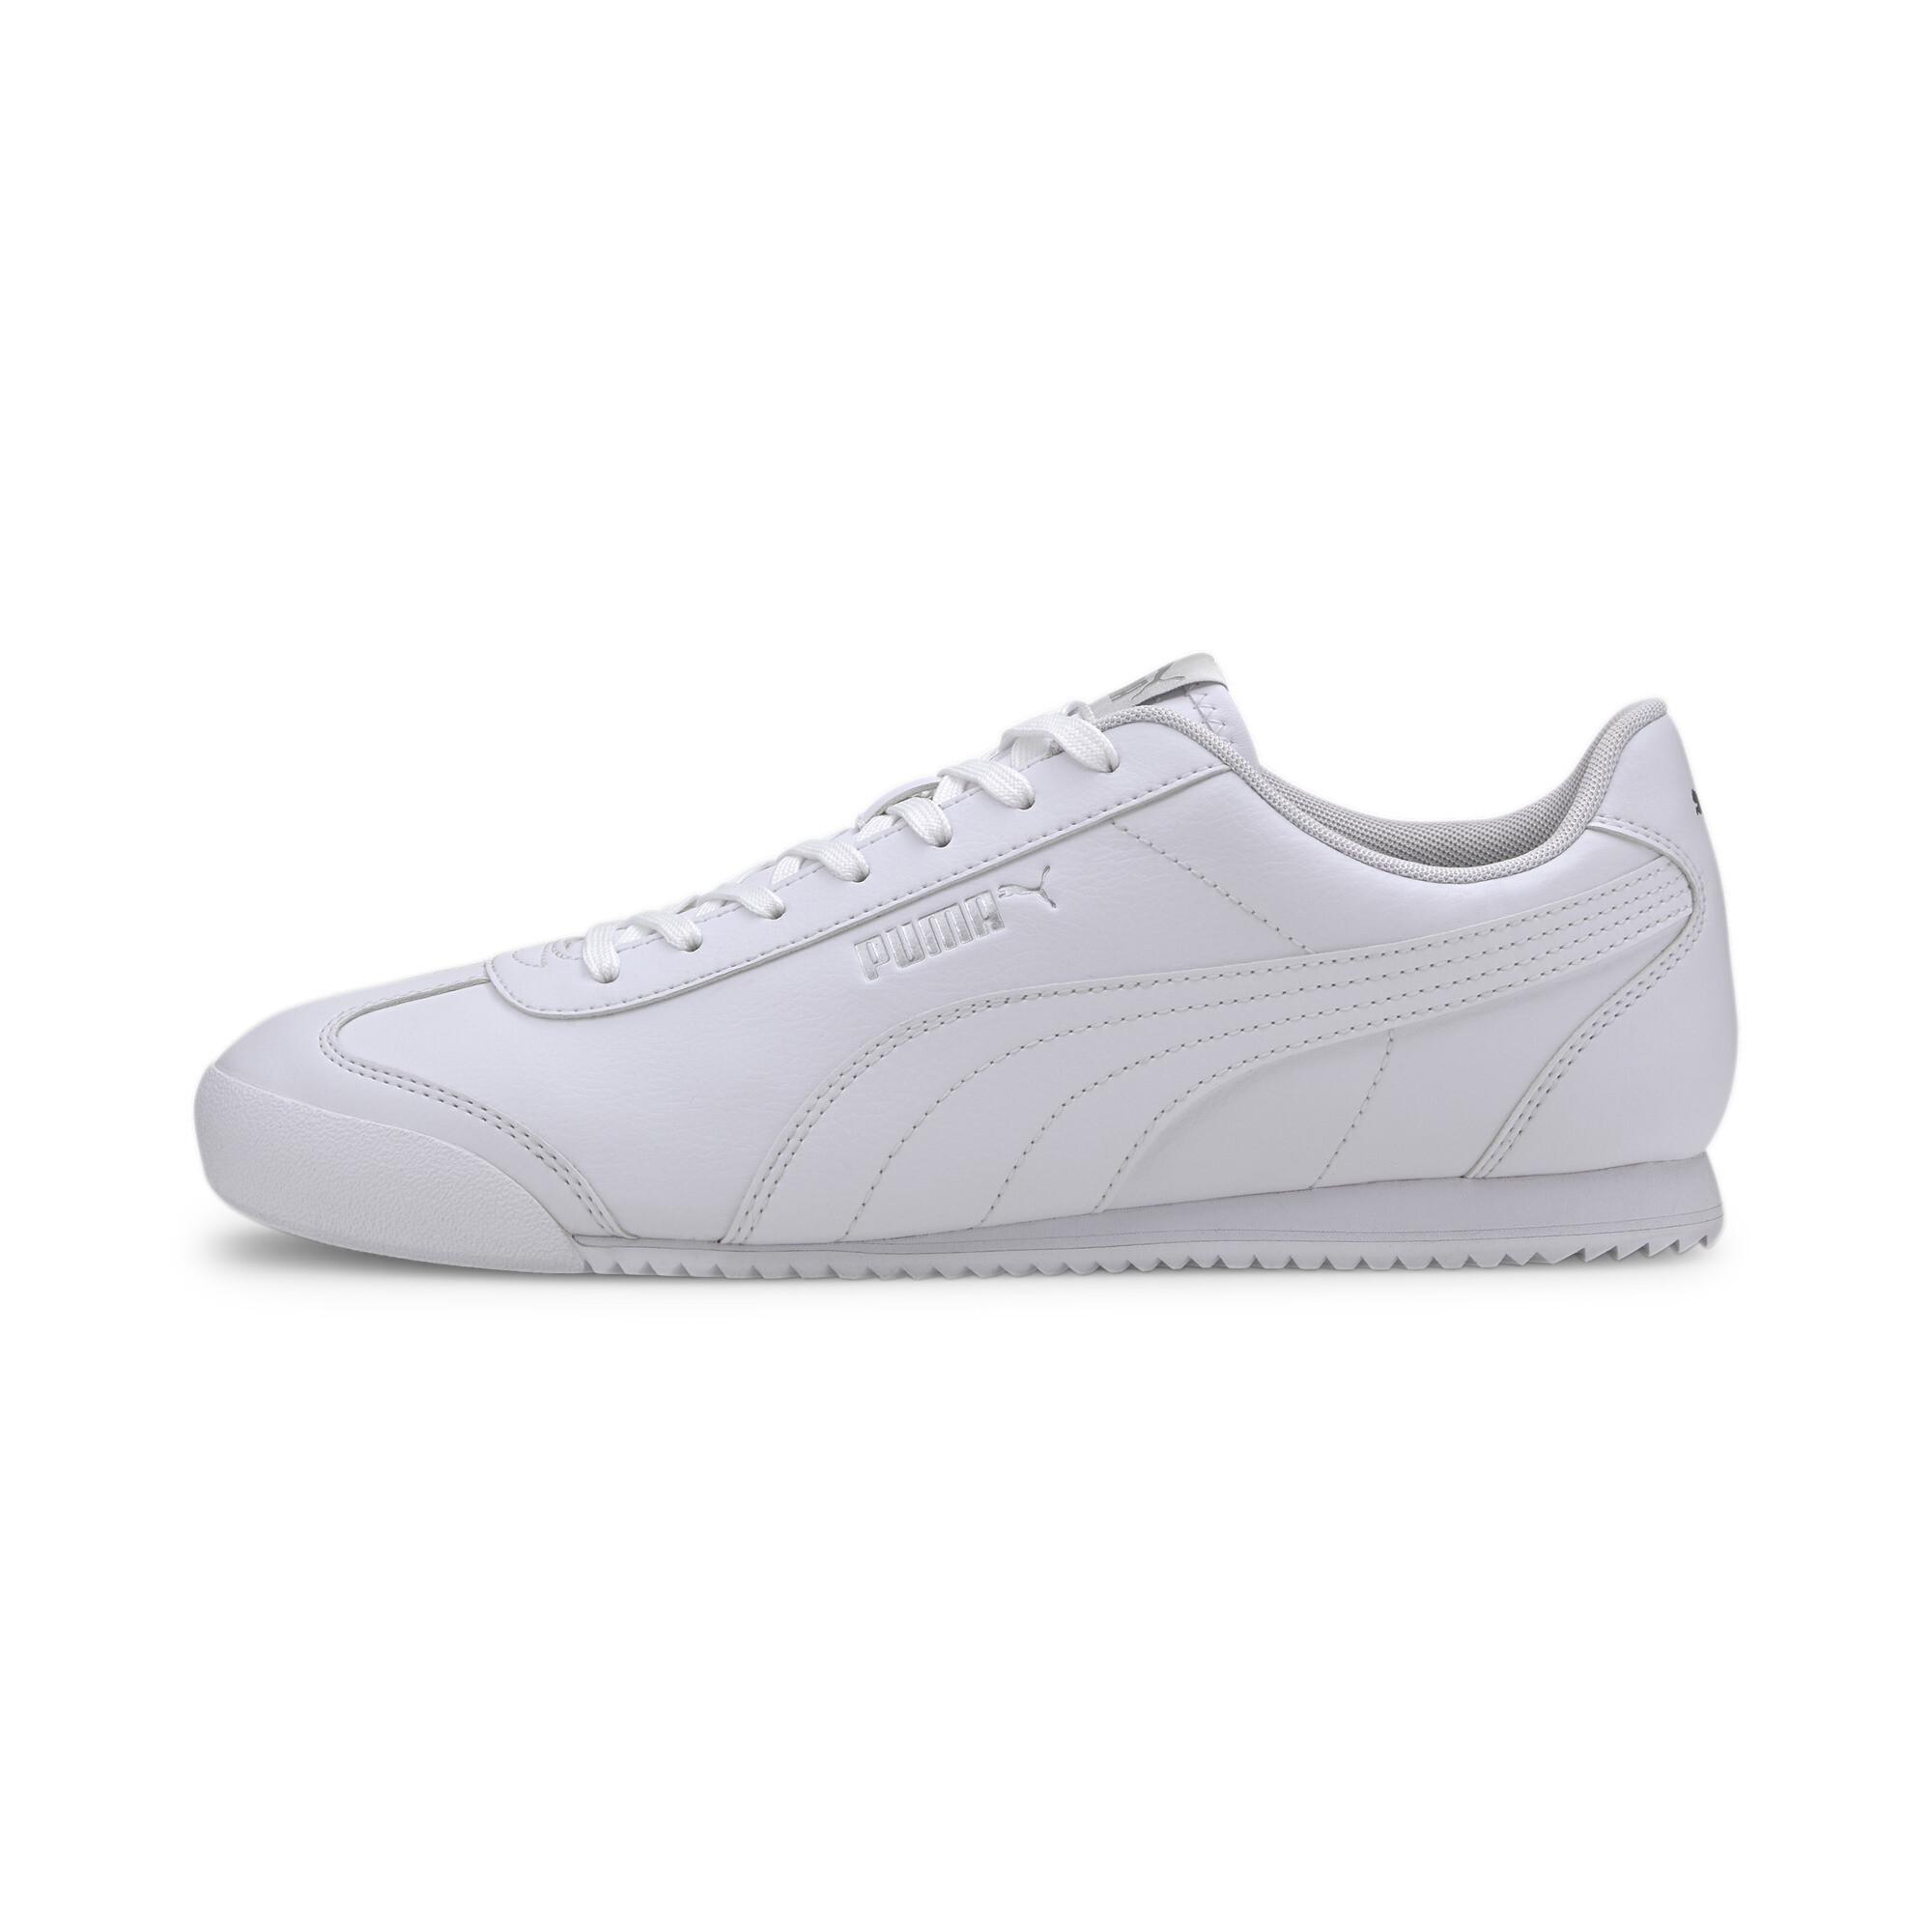 PUMA-Men-039-s-Turino-SL-Sneakers thumbnail 4